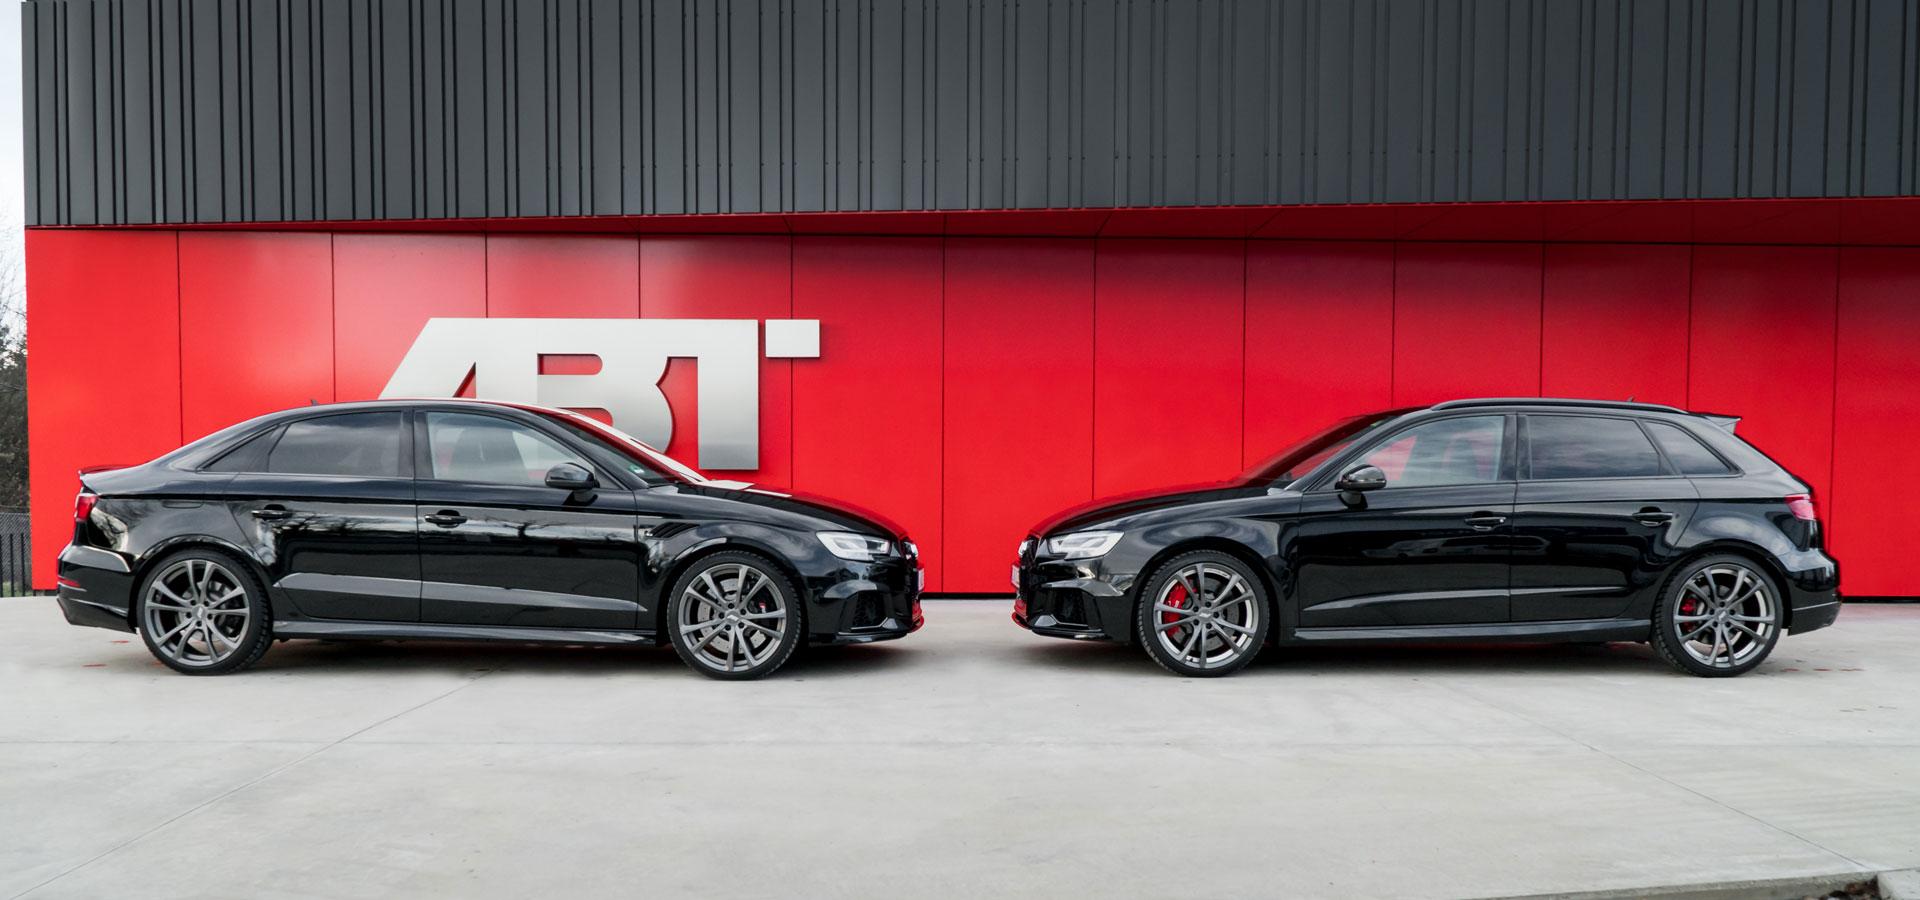 Audi RS3 - ABT Sportsline